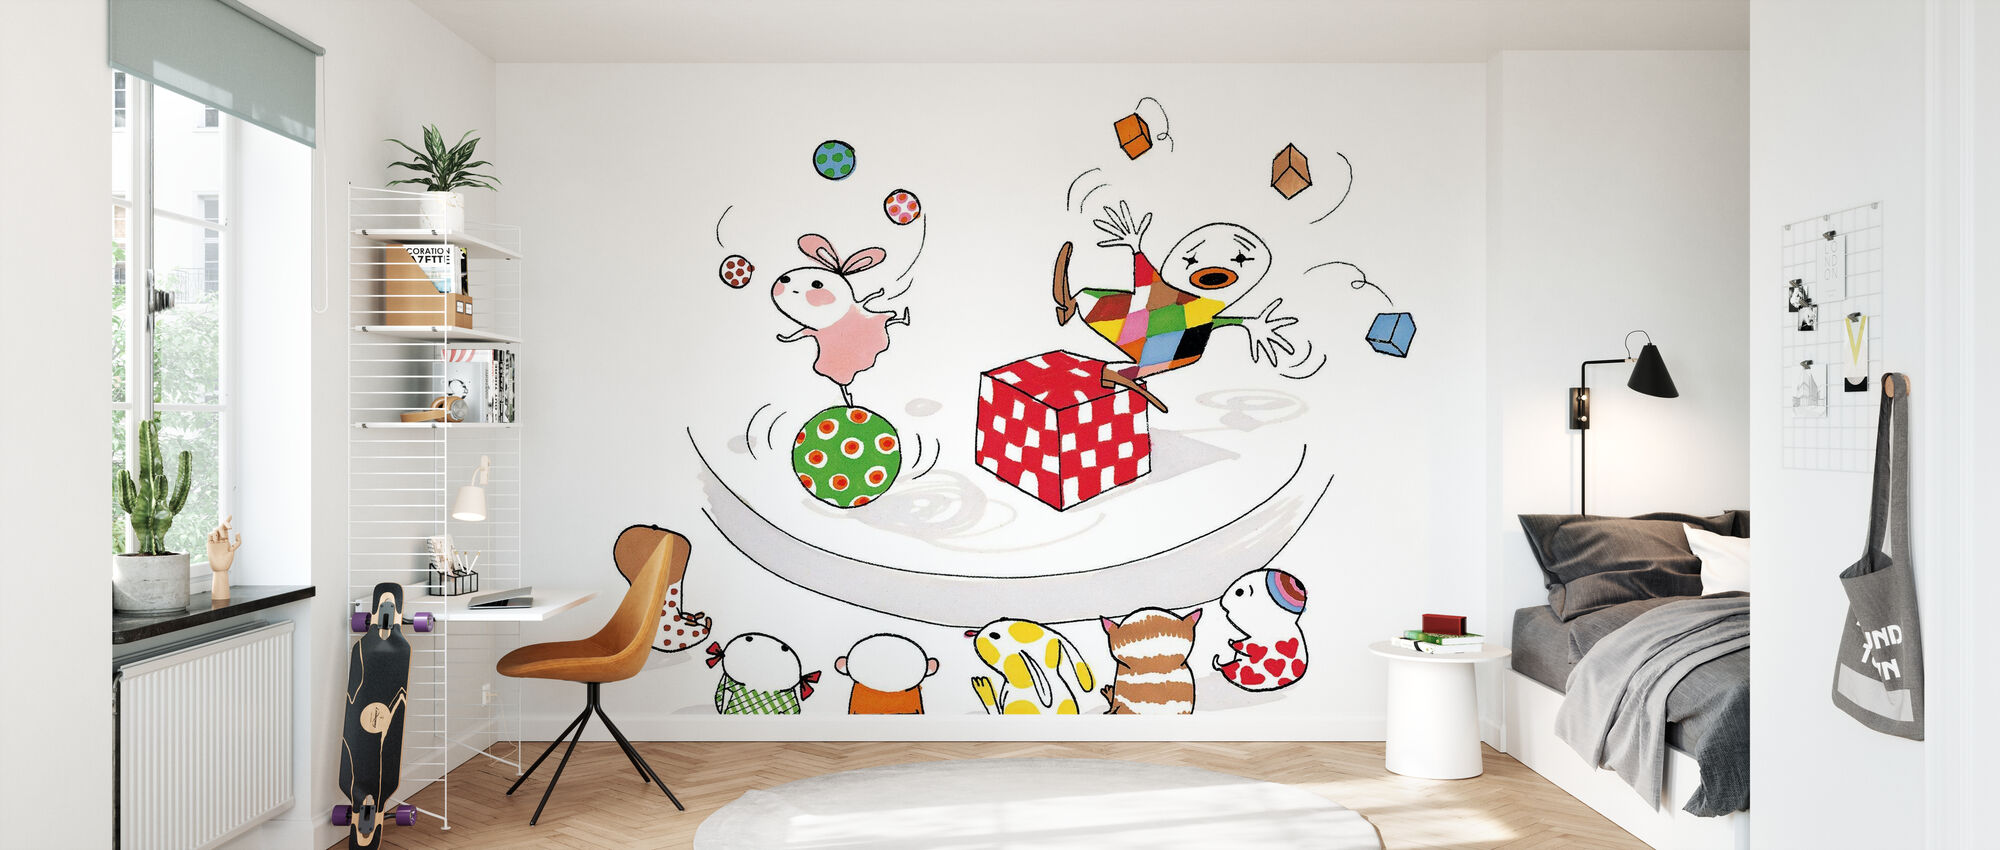 Jonglera - Wallpaper - Kids Room